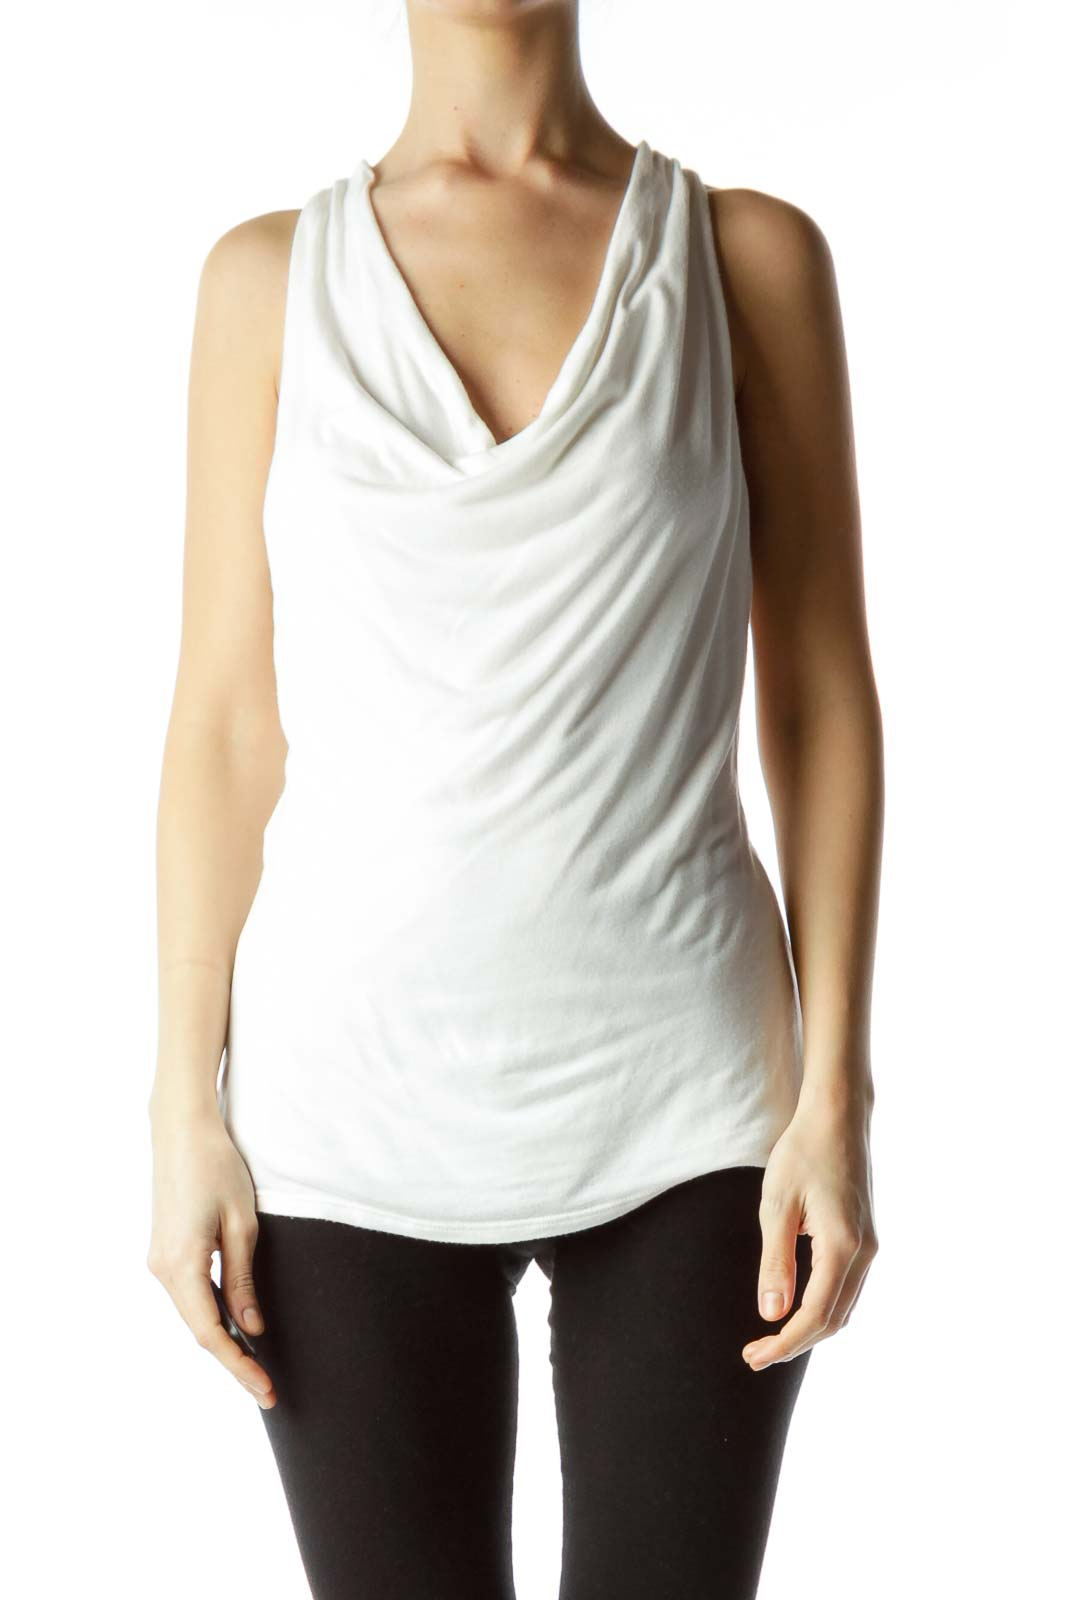 ca966e989caa15 Shop White Sleeveless Cowl Neck Top clothing and handbags at ...